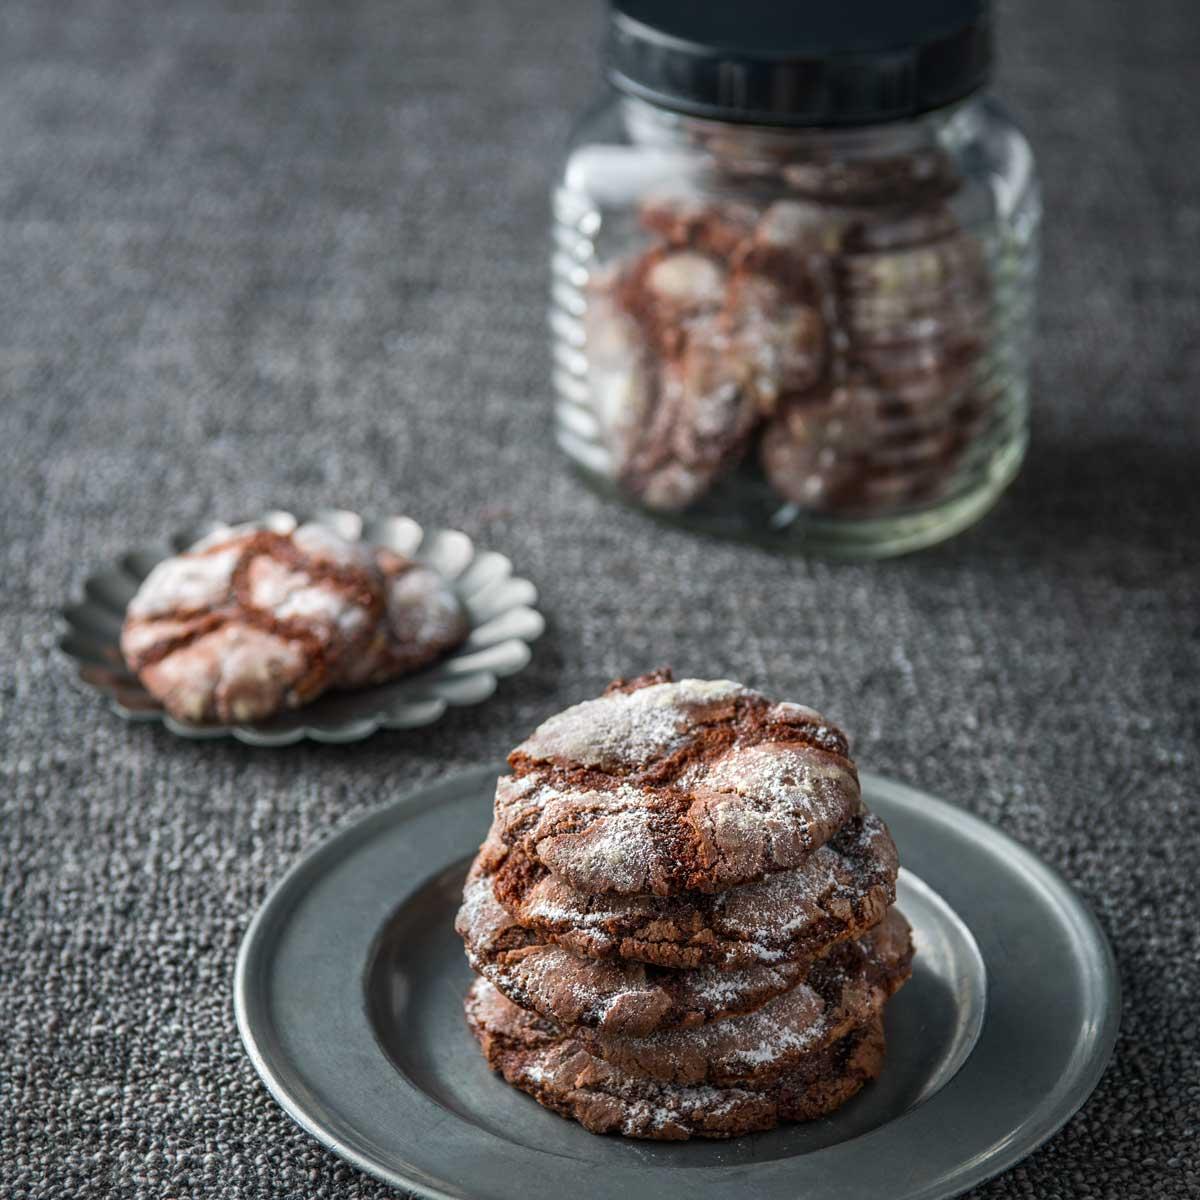 Haigh's Chocolate Crackle Cookies